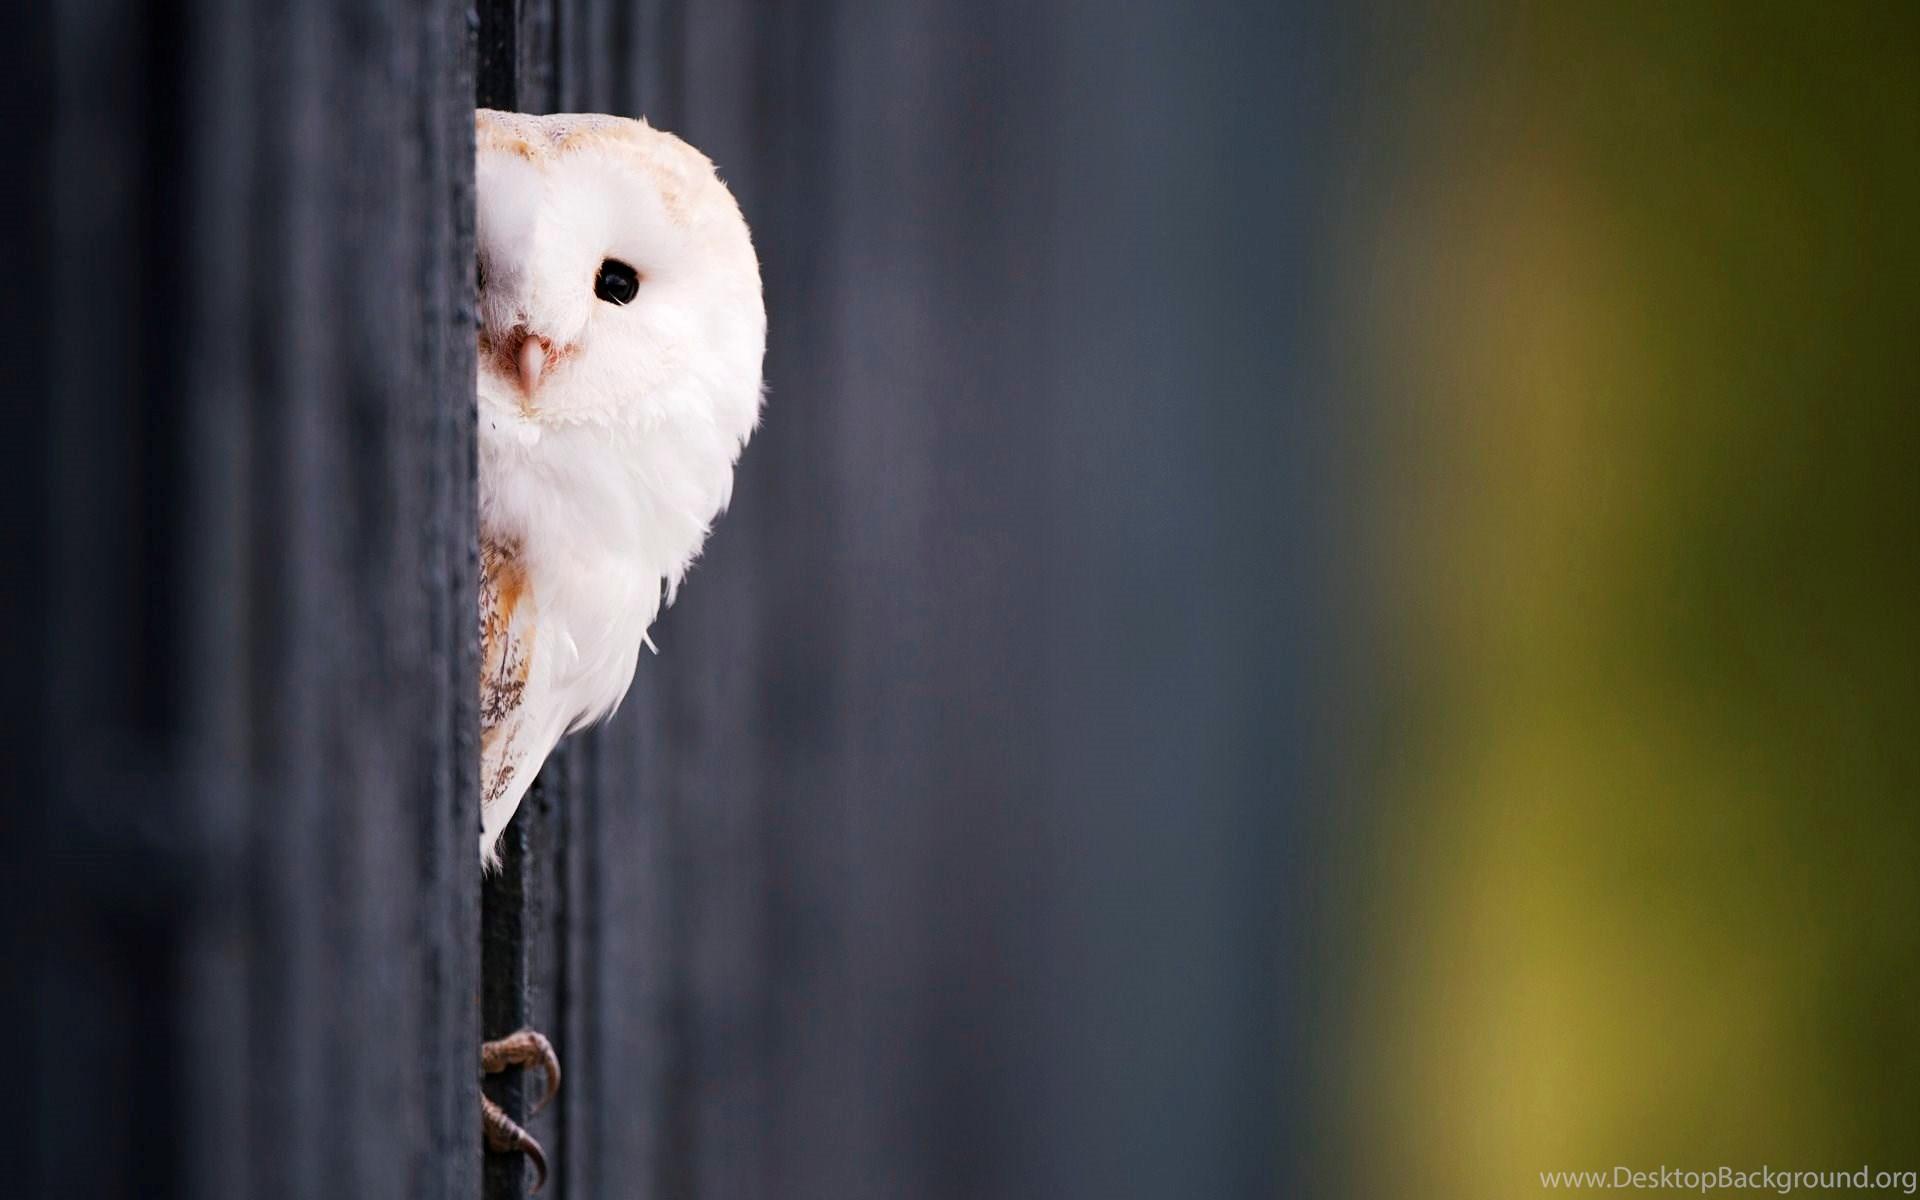 Cute White Owl Wallpapers Desktop Background